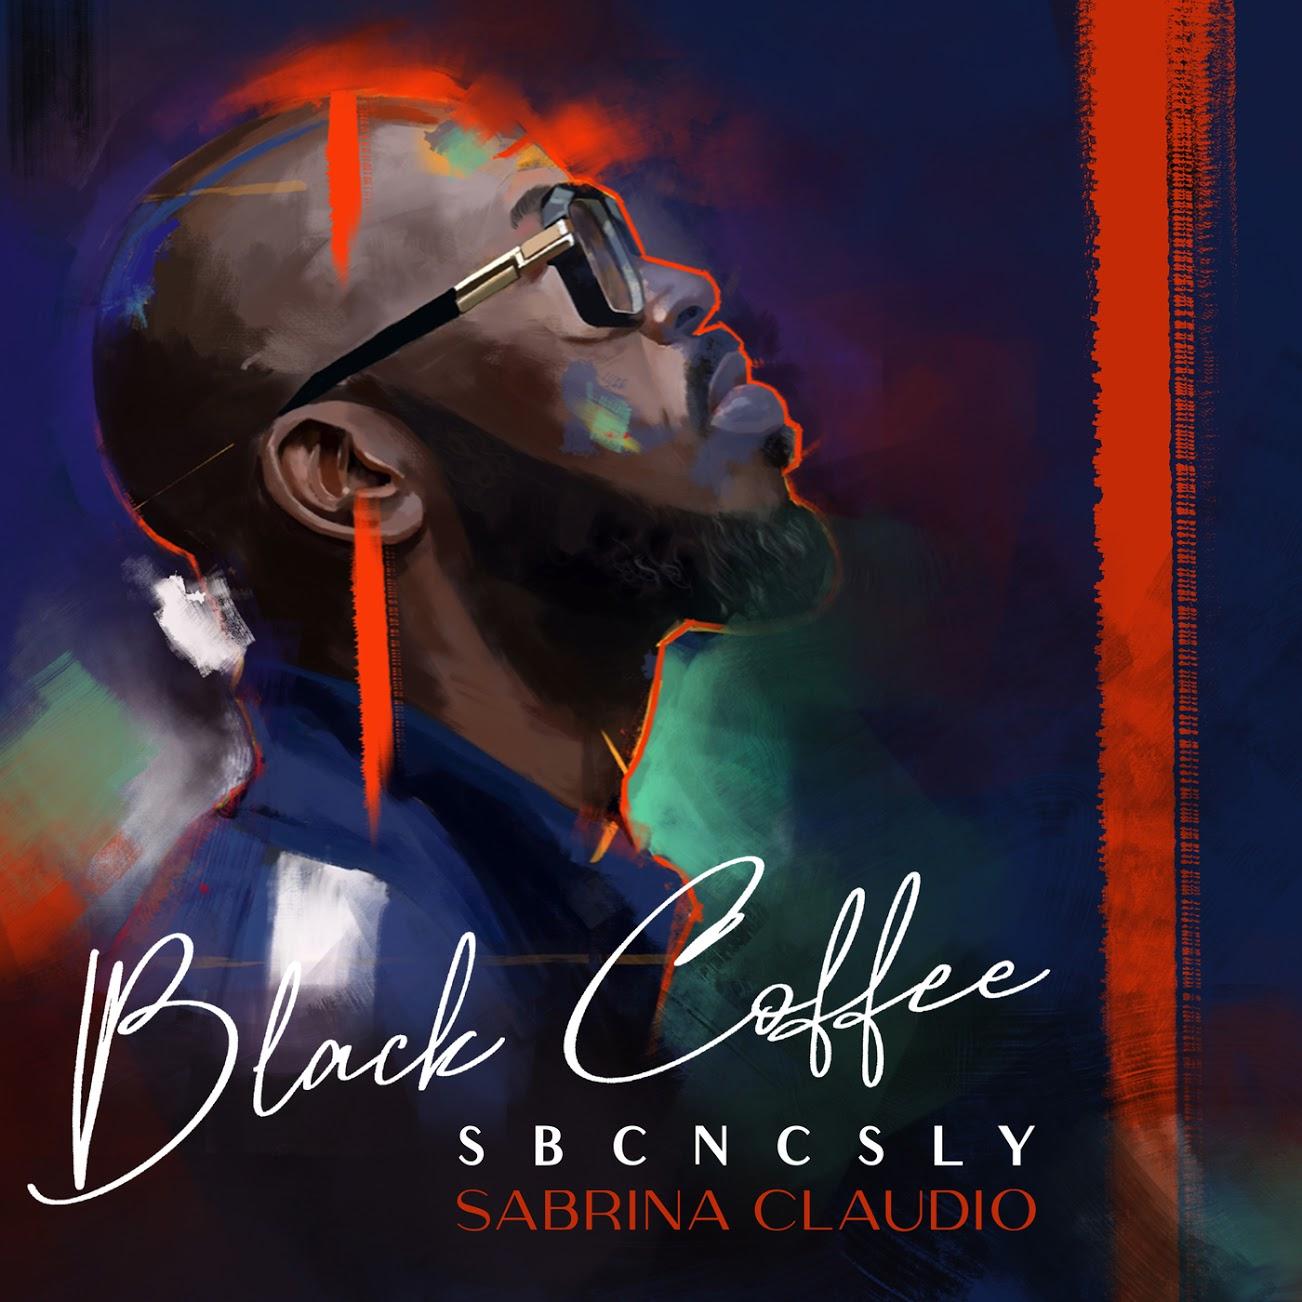 Black Coffee Feat. Sabrina Claudio - SBCNCSLY